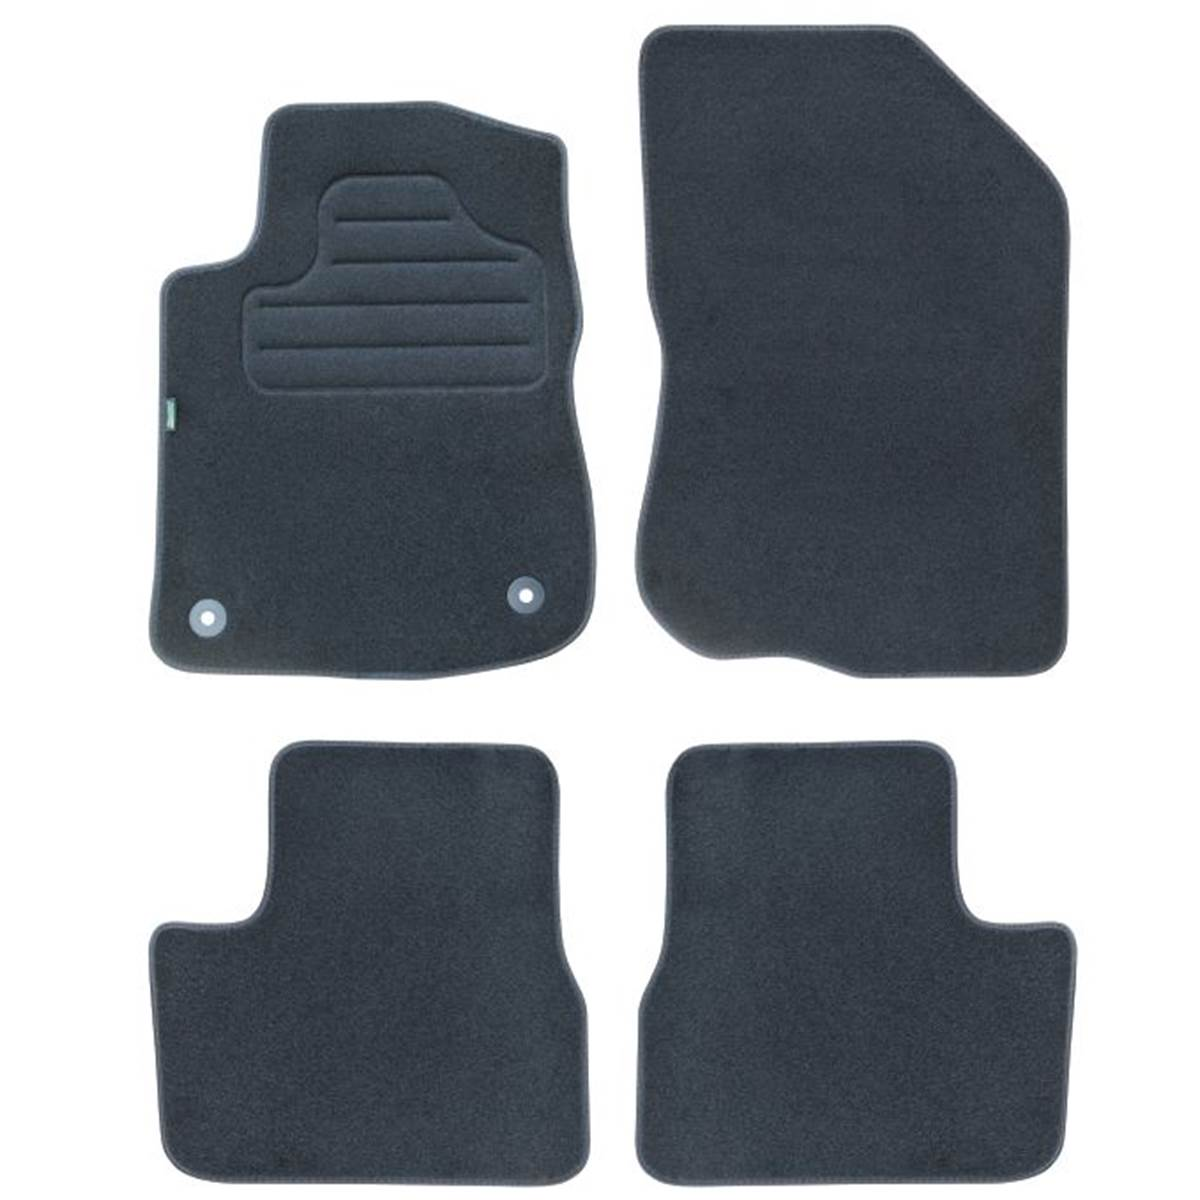 Carrelage design tapis 208 peugeot moderne design pour for Moquette inondee 207